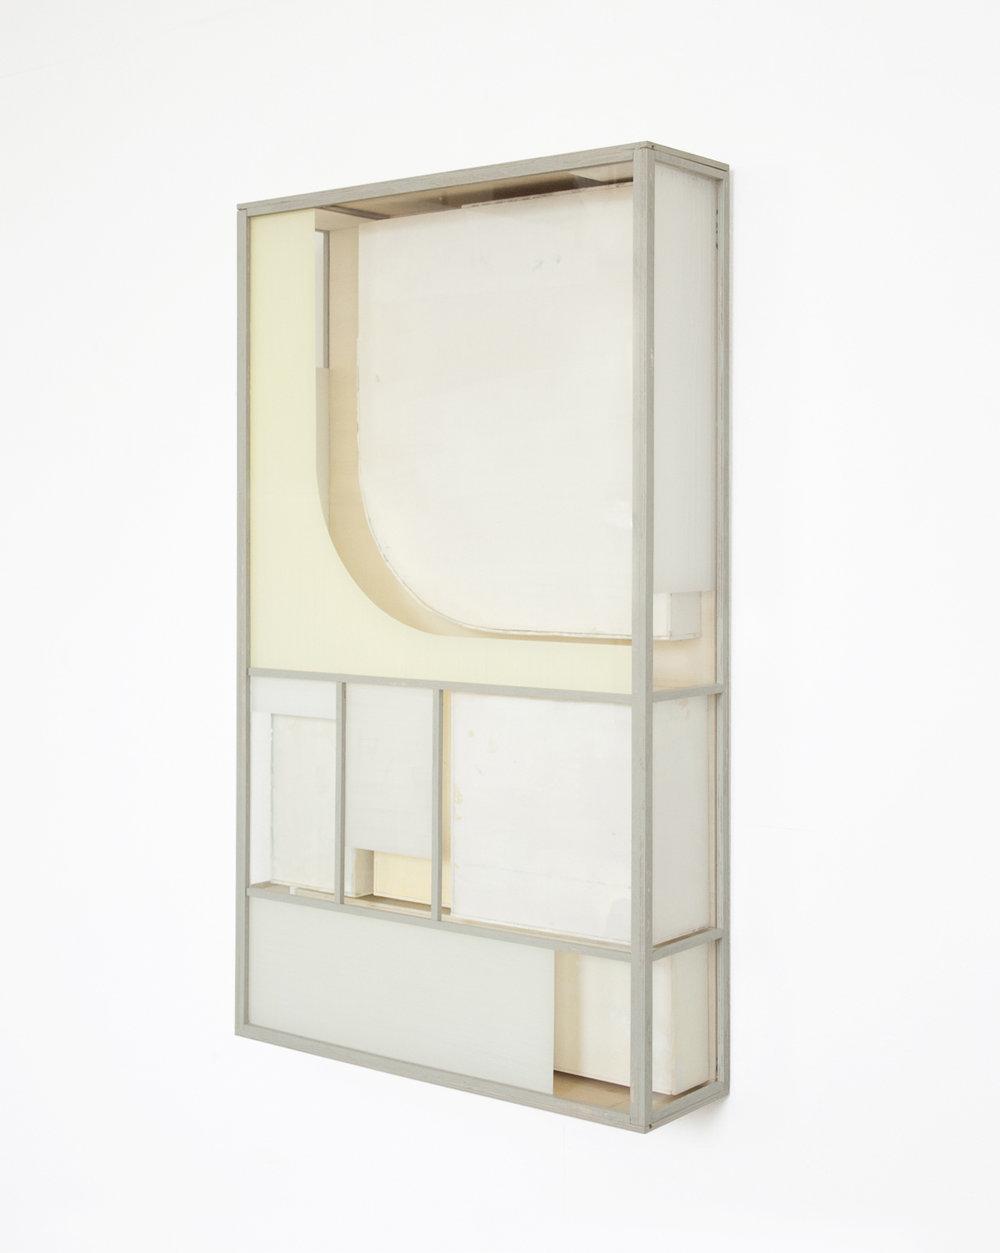 Minimal FM 2, 2018, wood, acrylic glass, paint, 81 x 47 x 13 cm